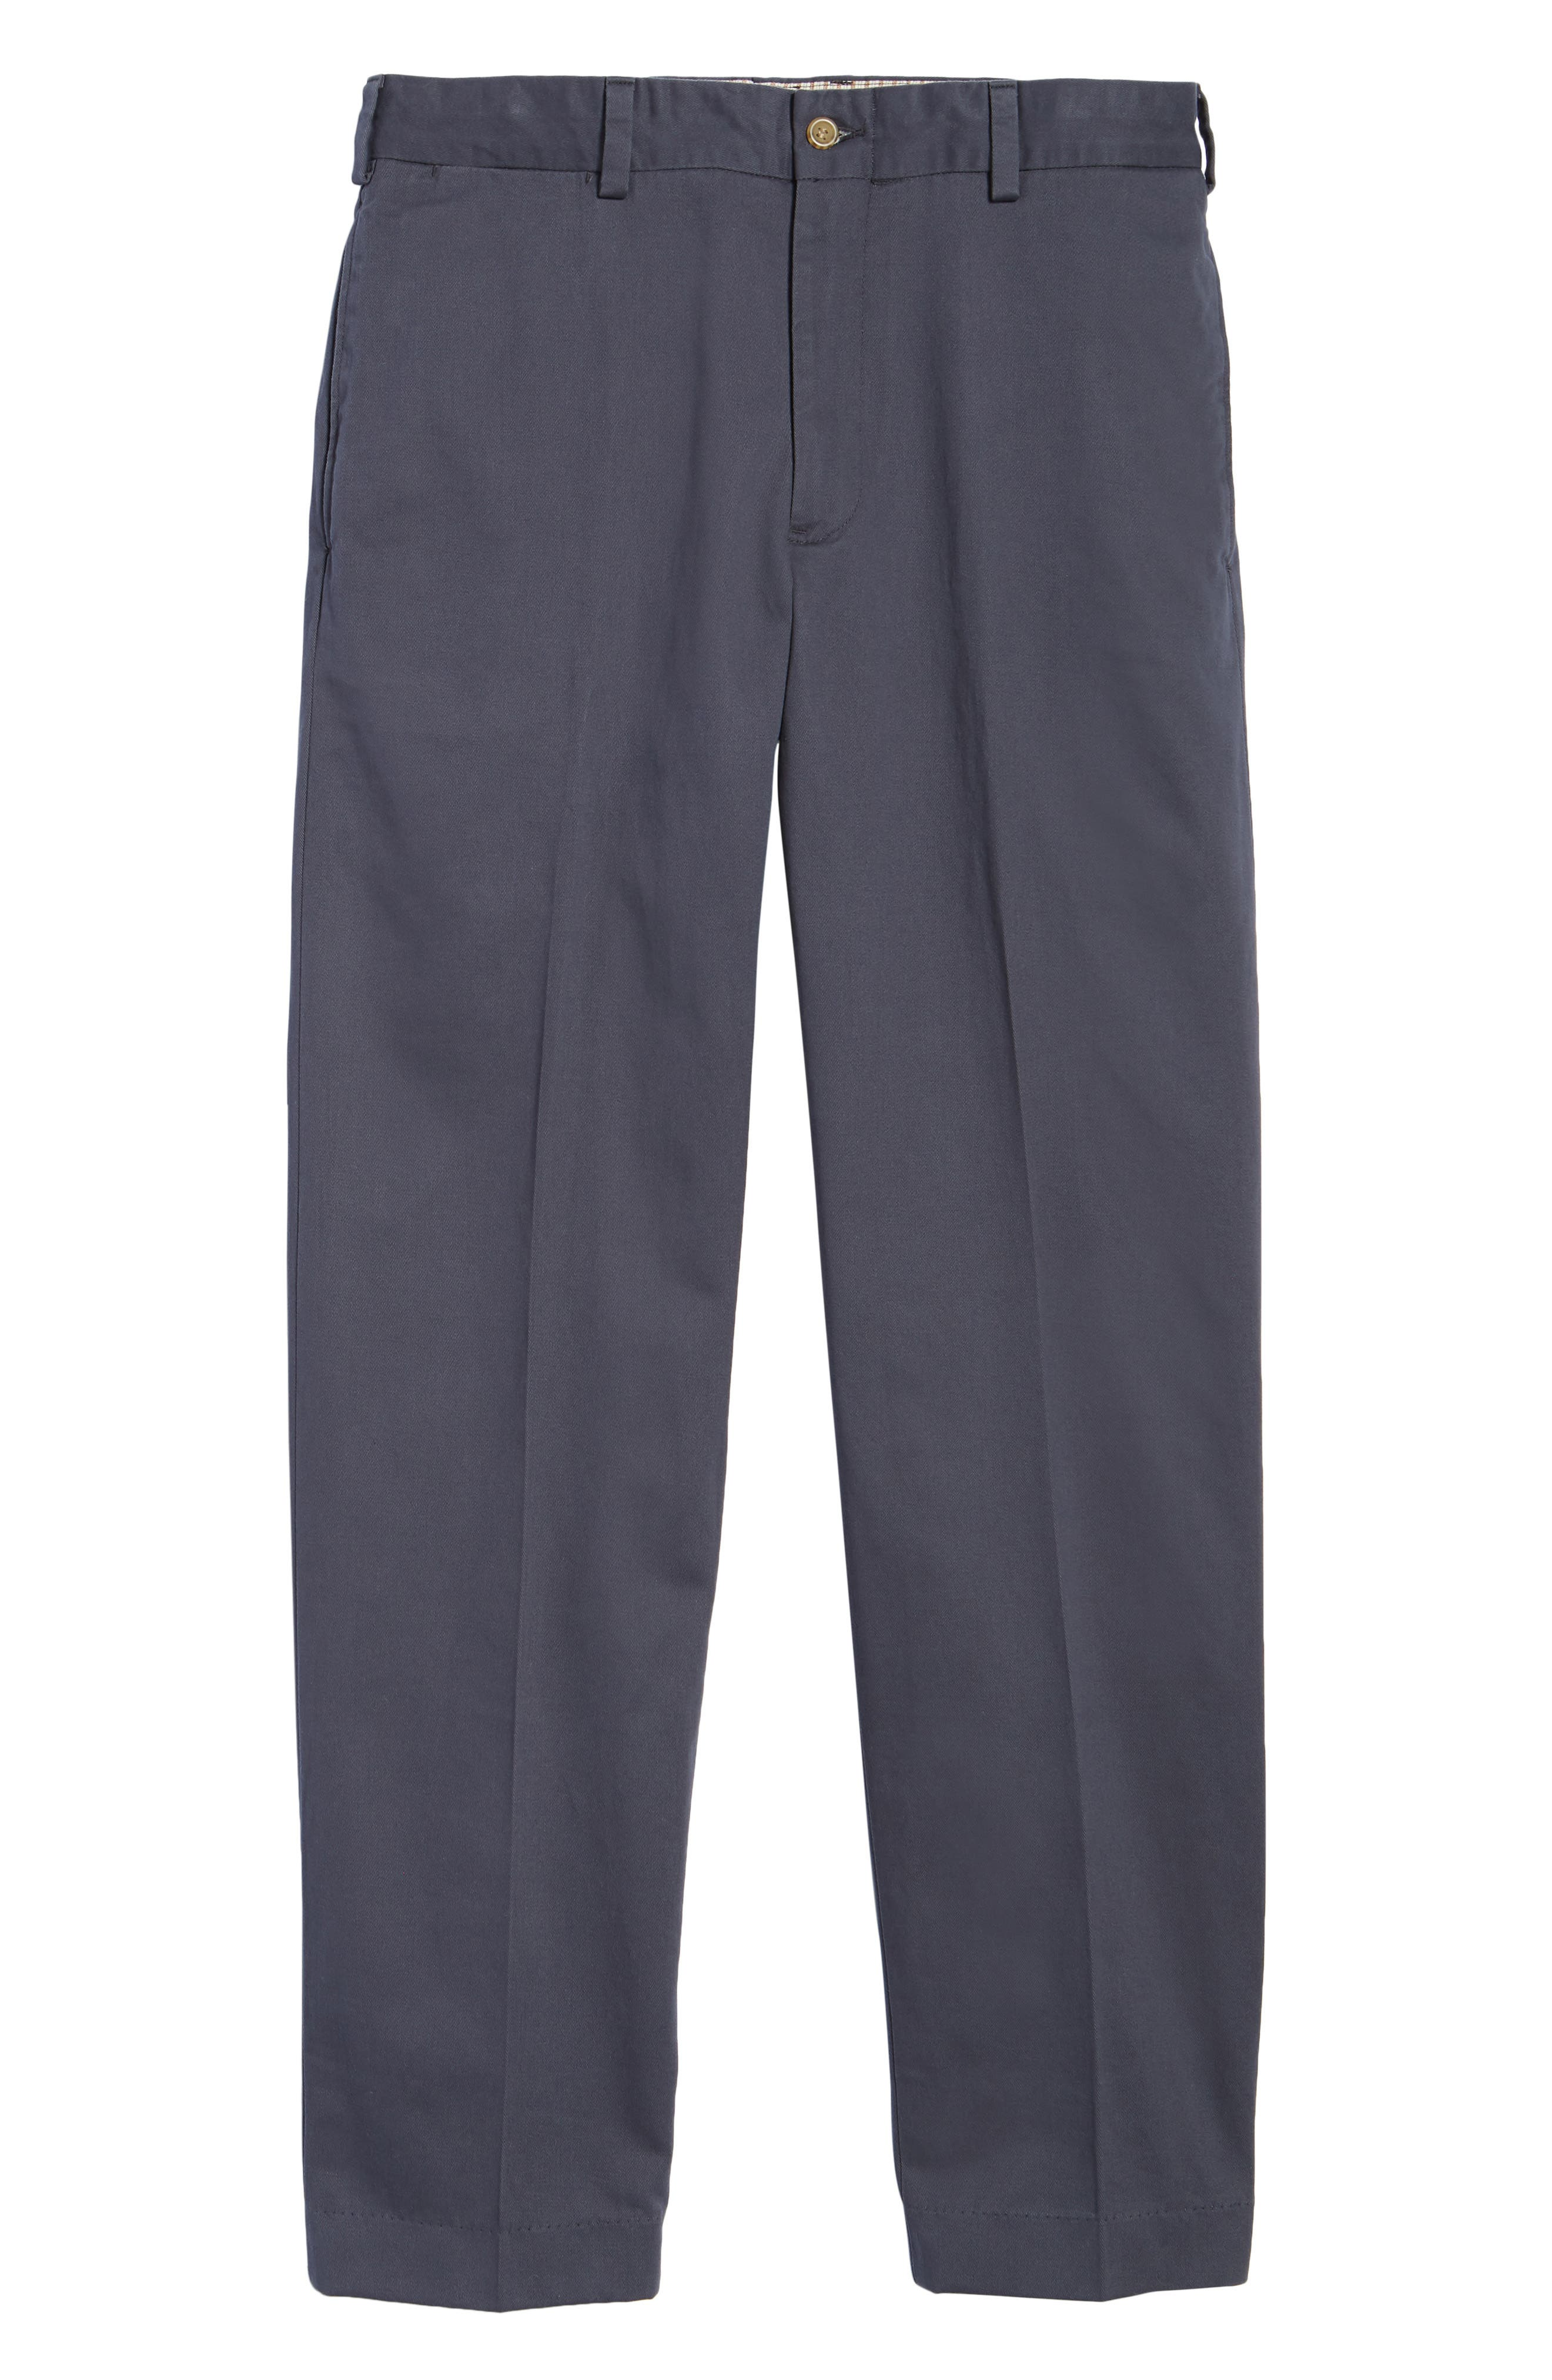 M2 Classic Fit Flat Front Vintage Twill Pants,                             Alternate thumbnail 6, color,